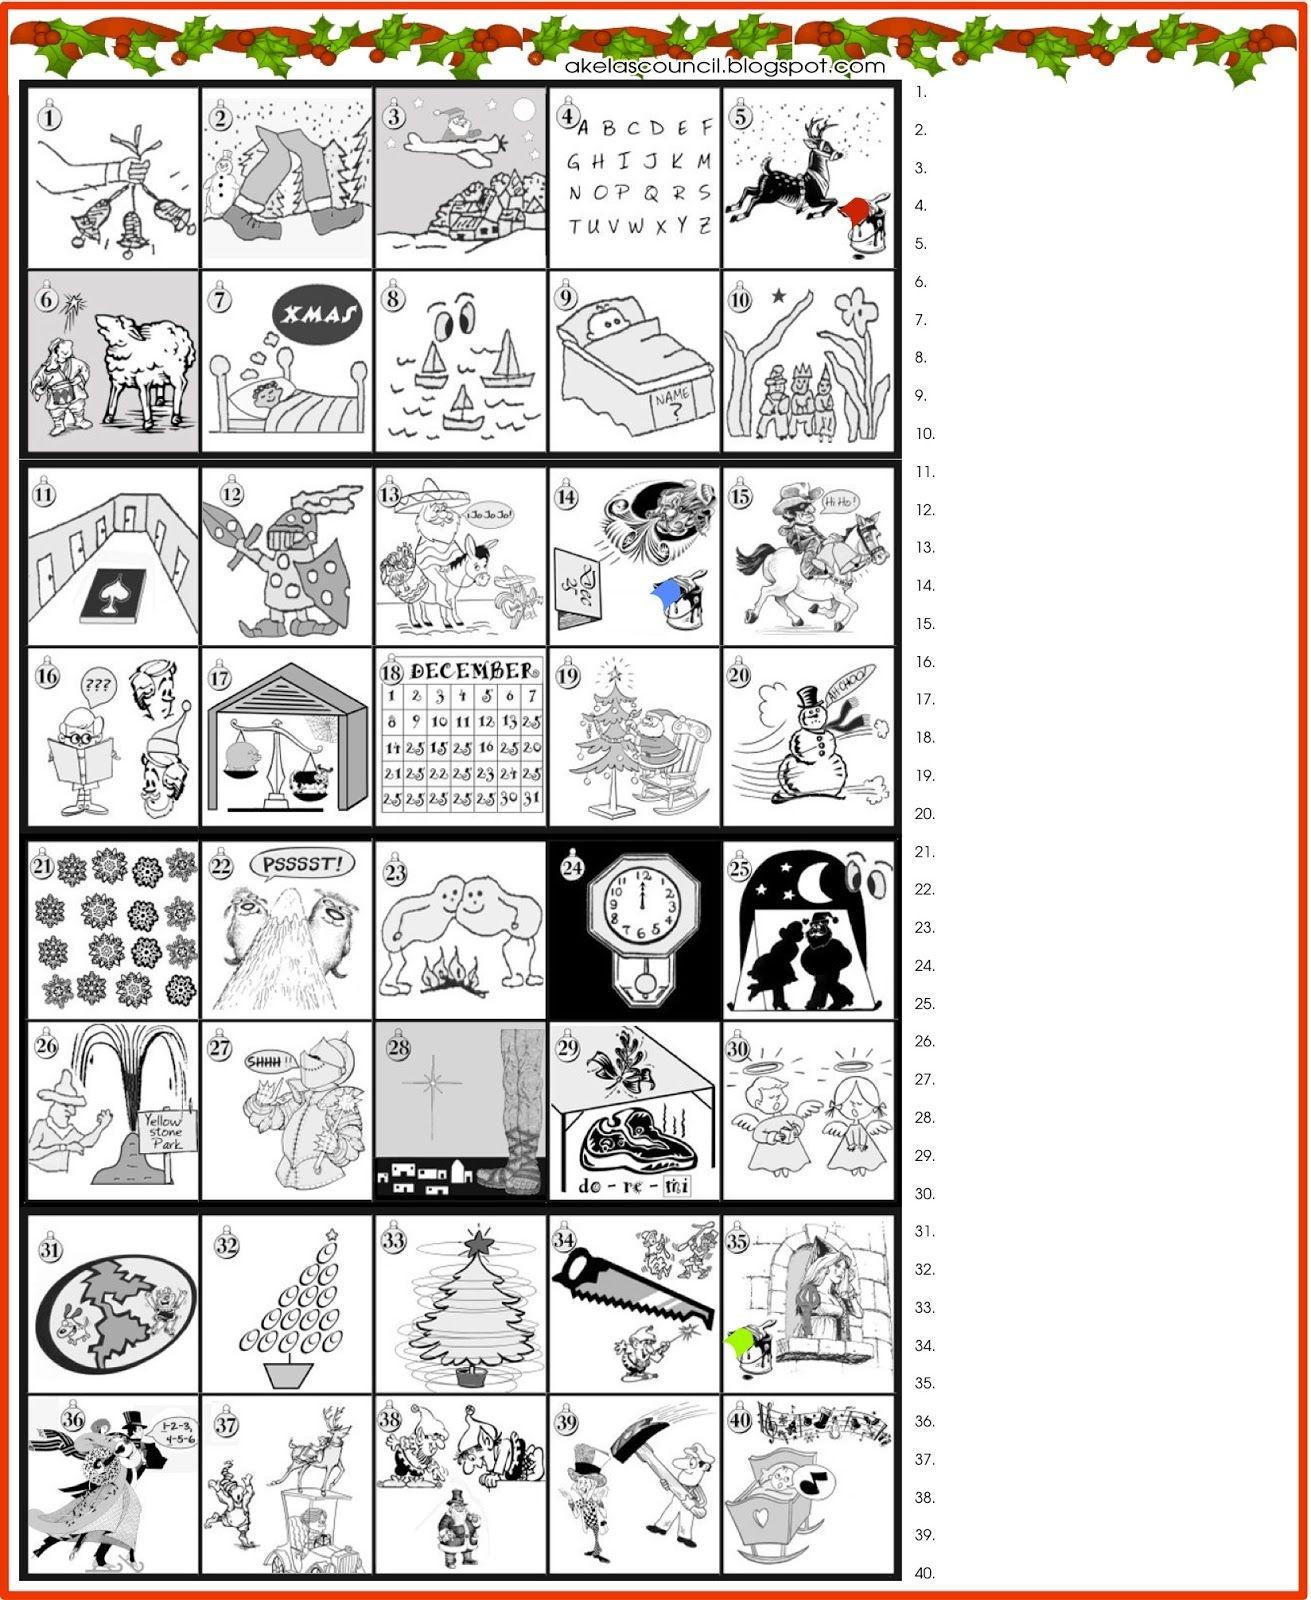 Printable * Guess The Christmas Songs Or Carols Word Puzzle - Free Printable Christmas Puzzle Games